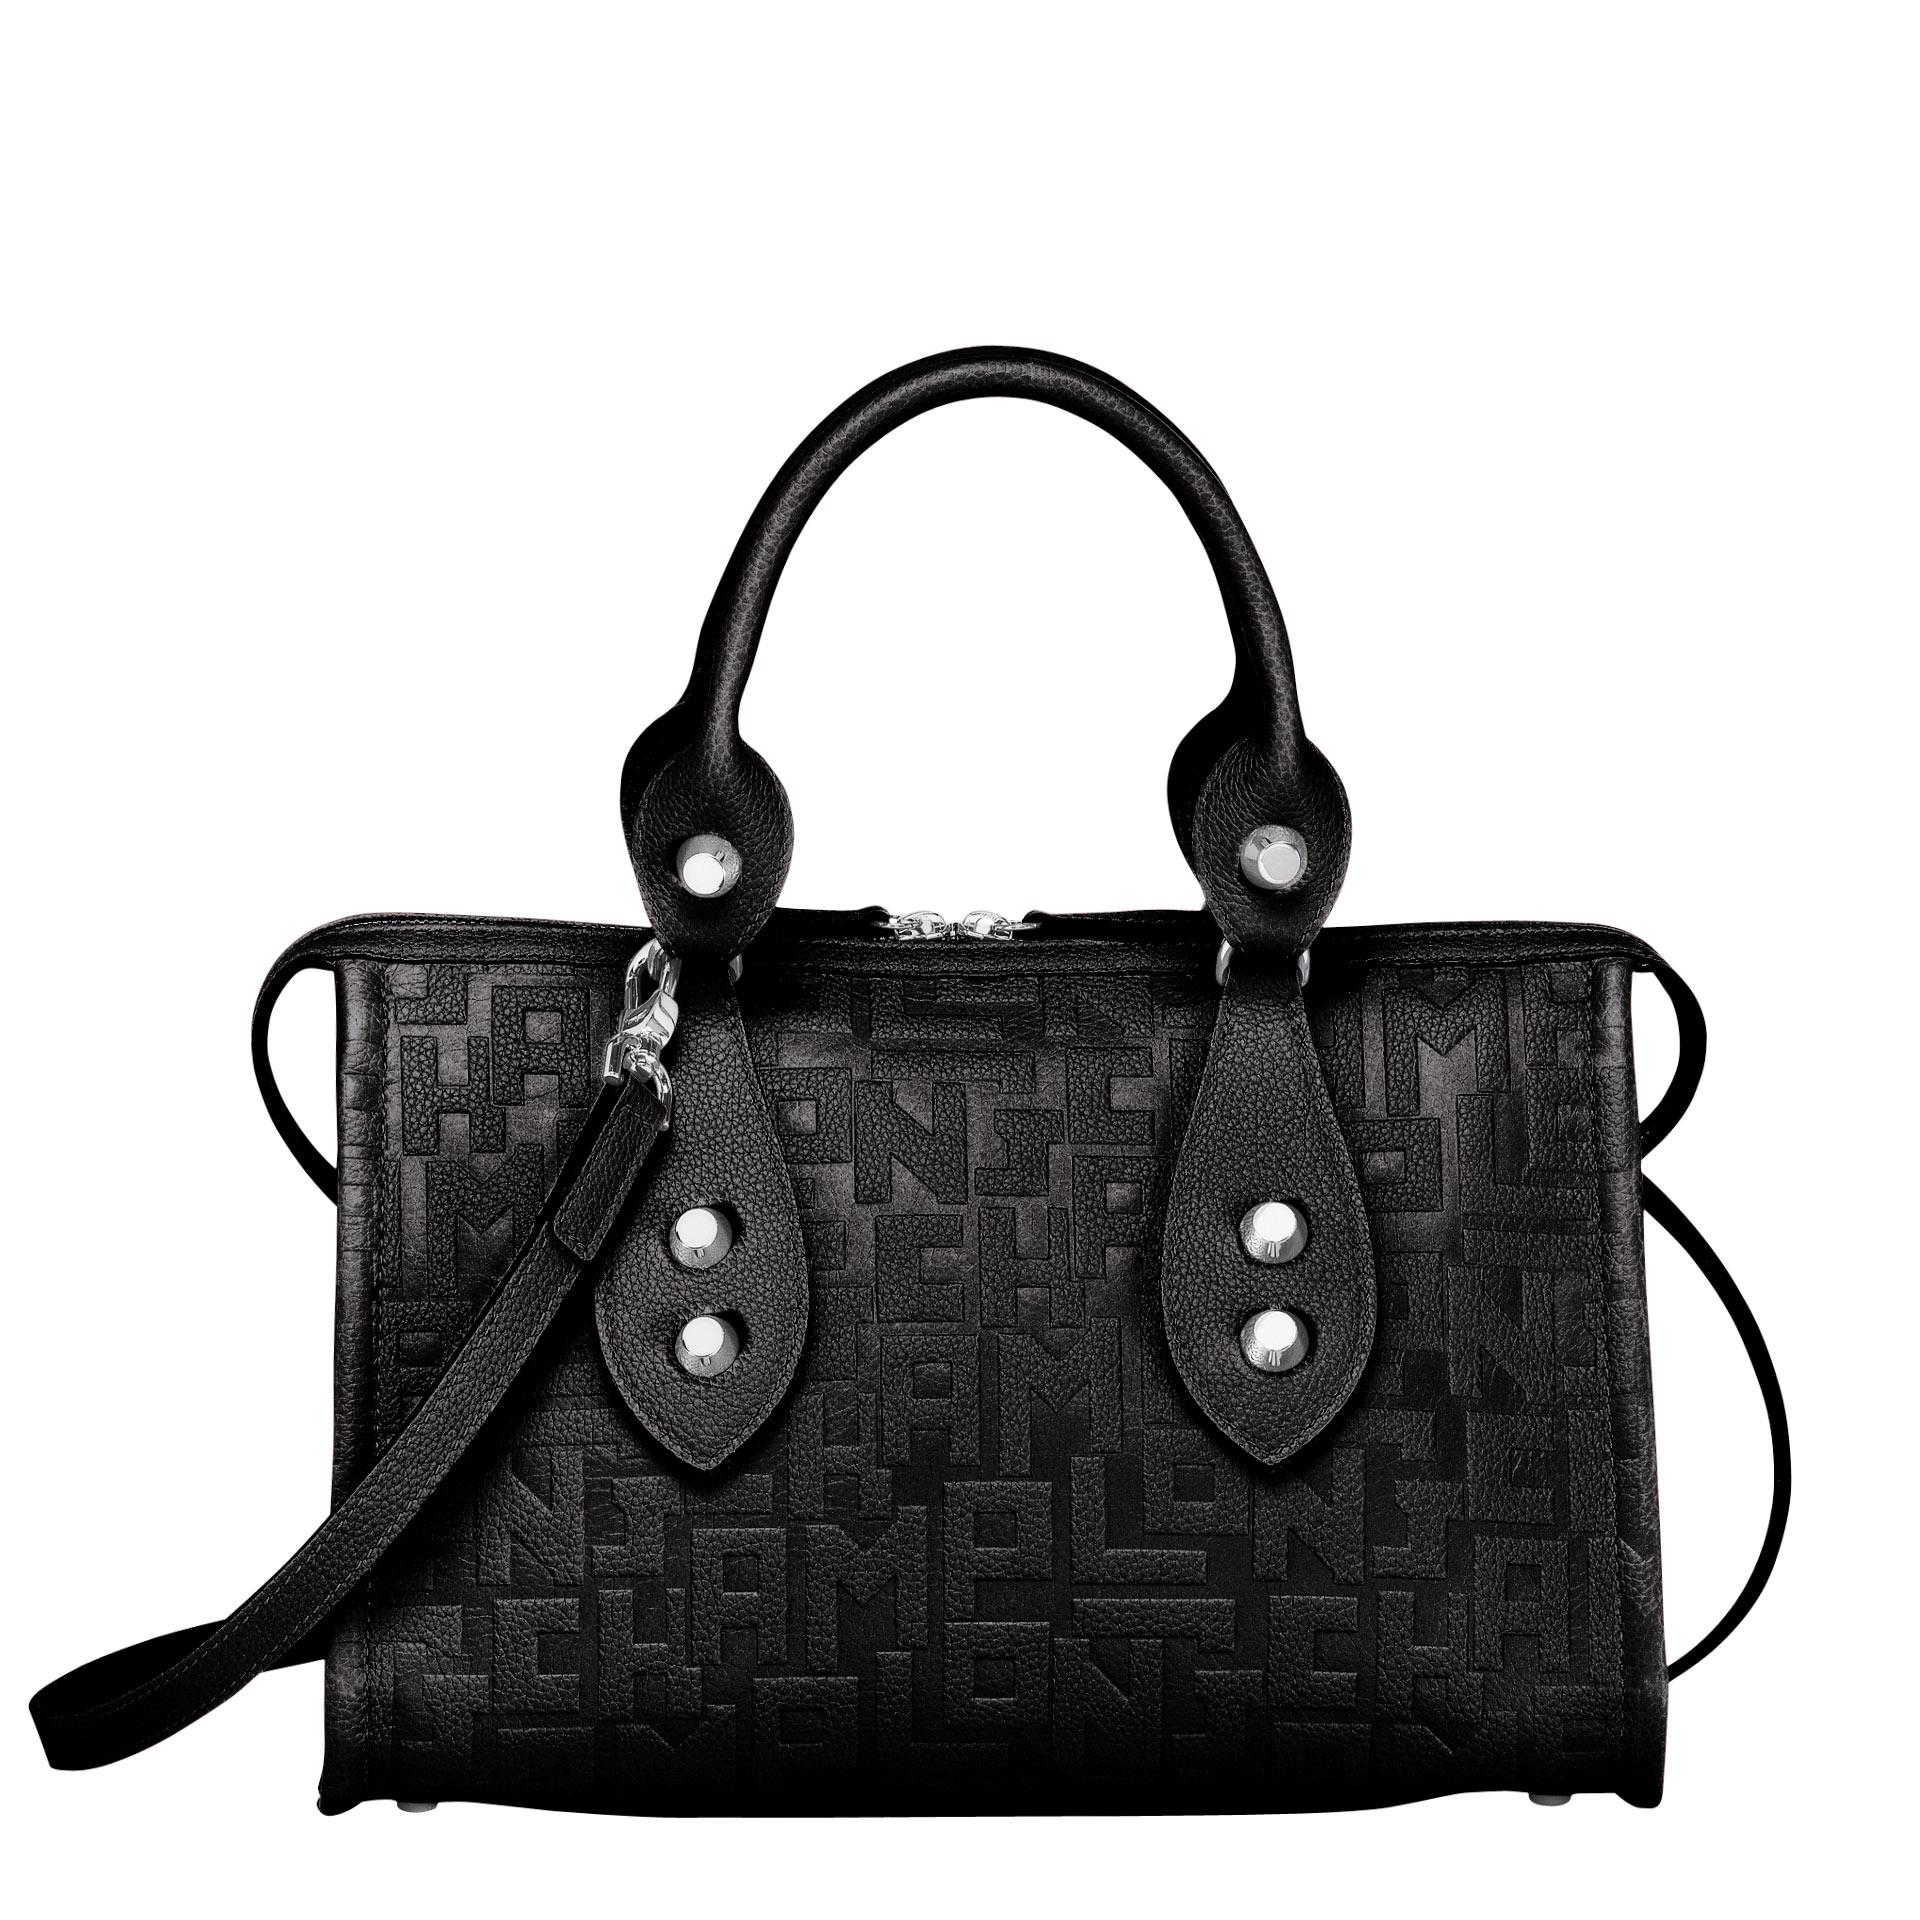 Longchamp La Voyageuse LGP Handtasche black